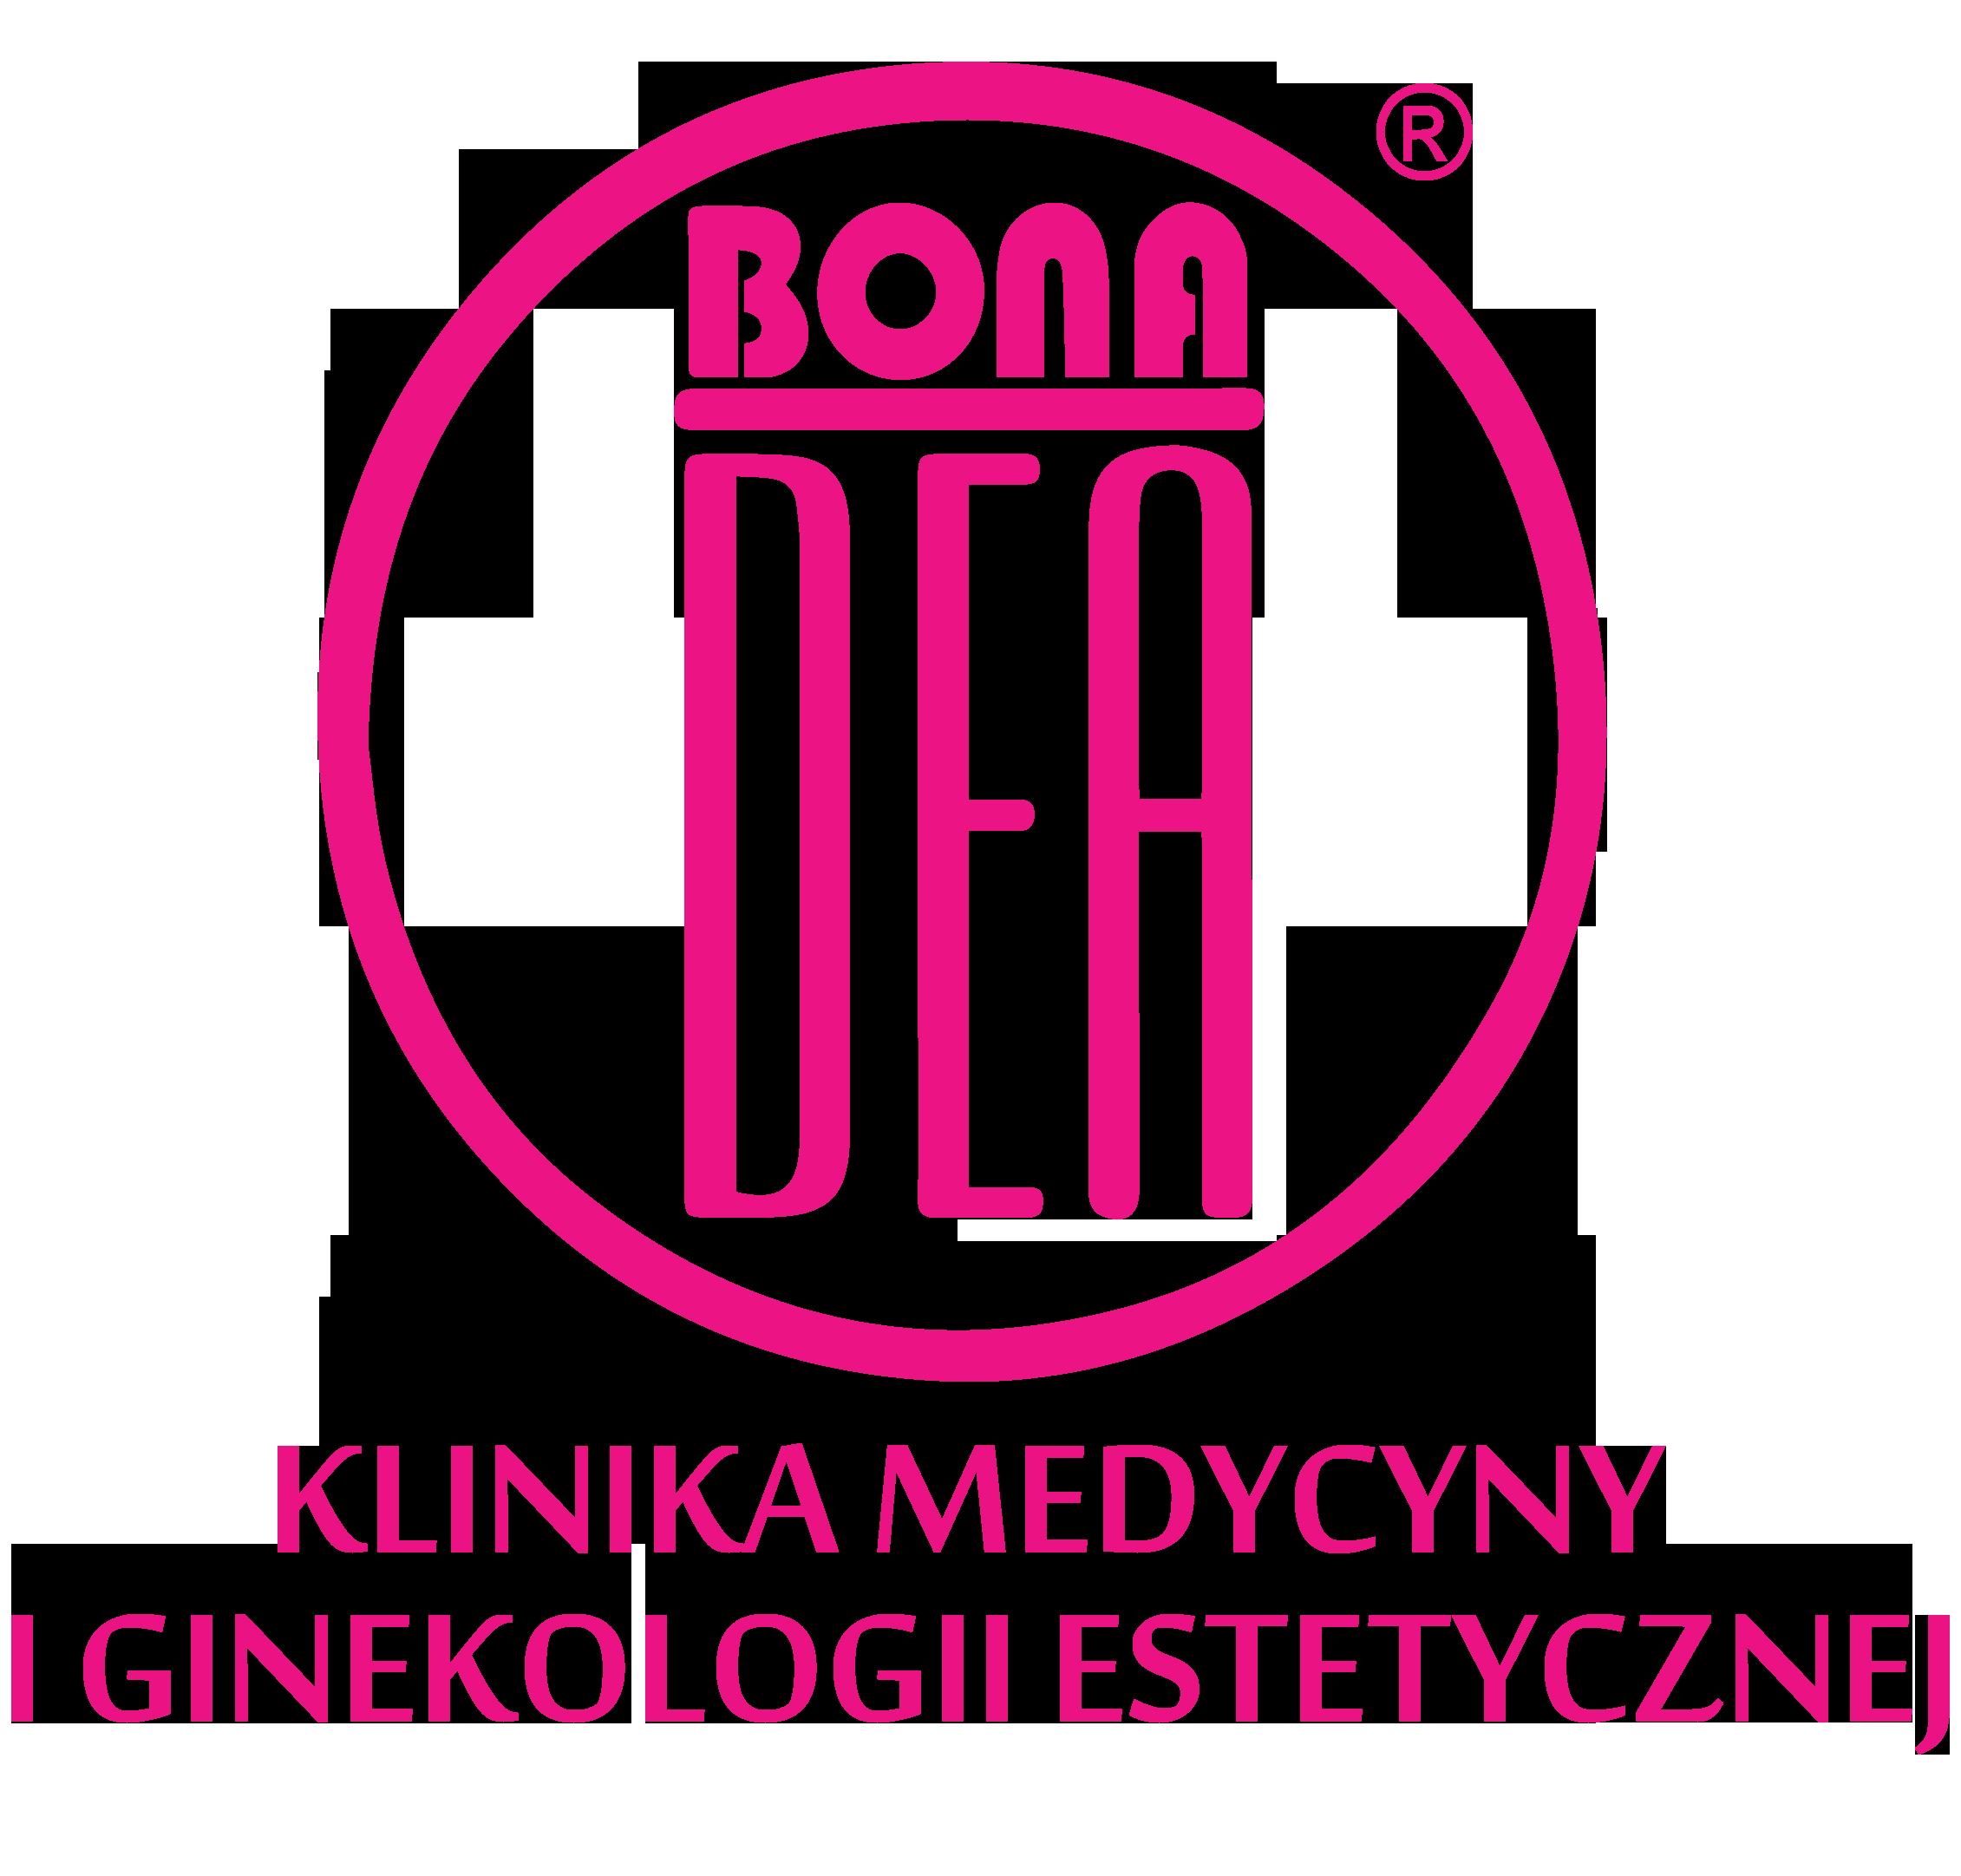 Bona_dea_new_logo